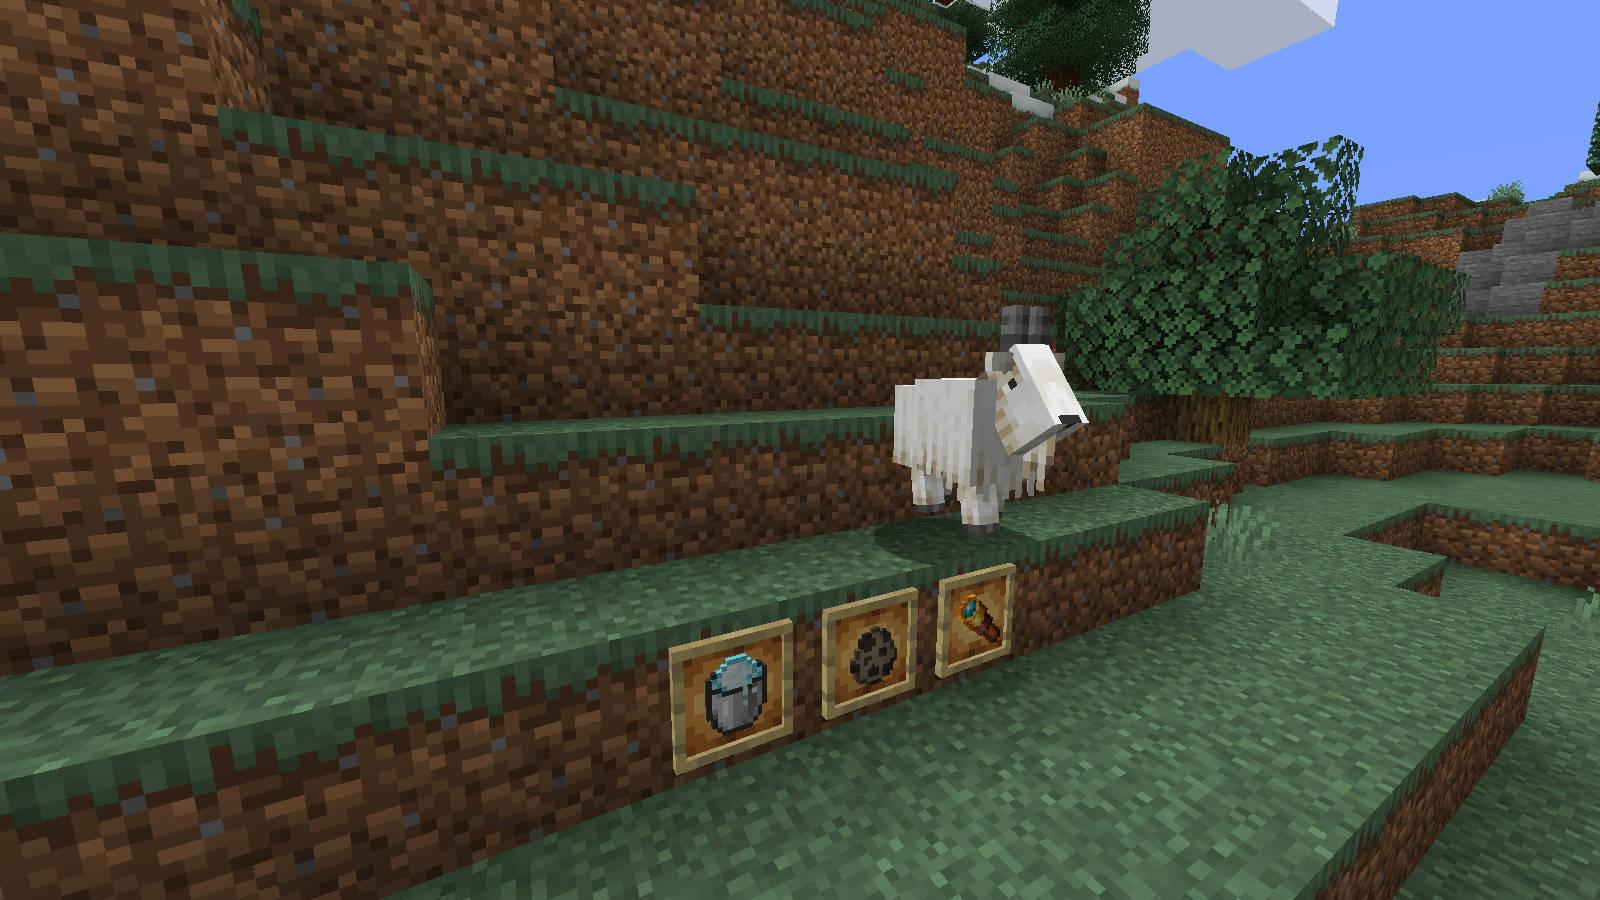 minecraft bedrock beta koza